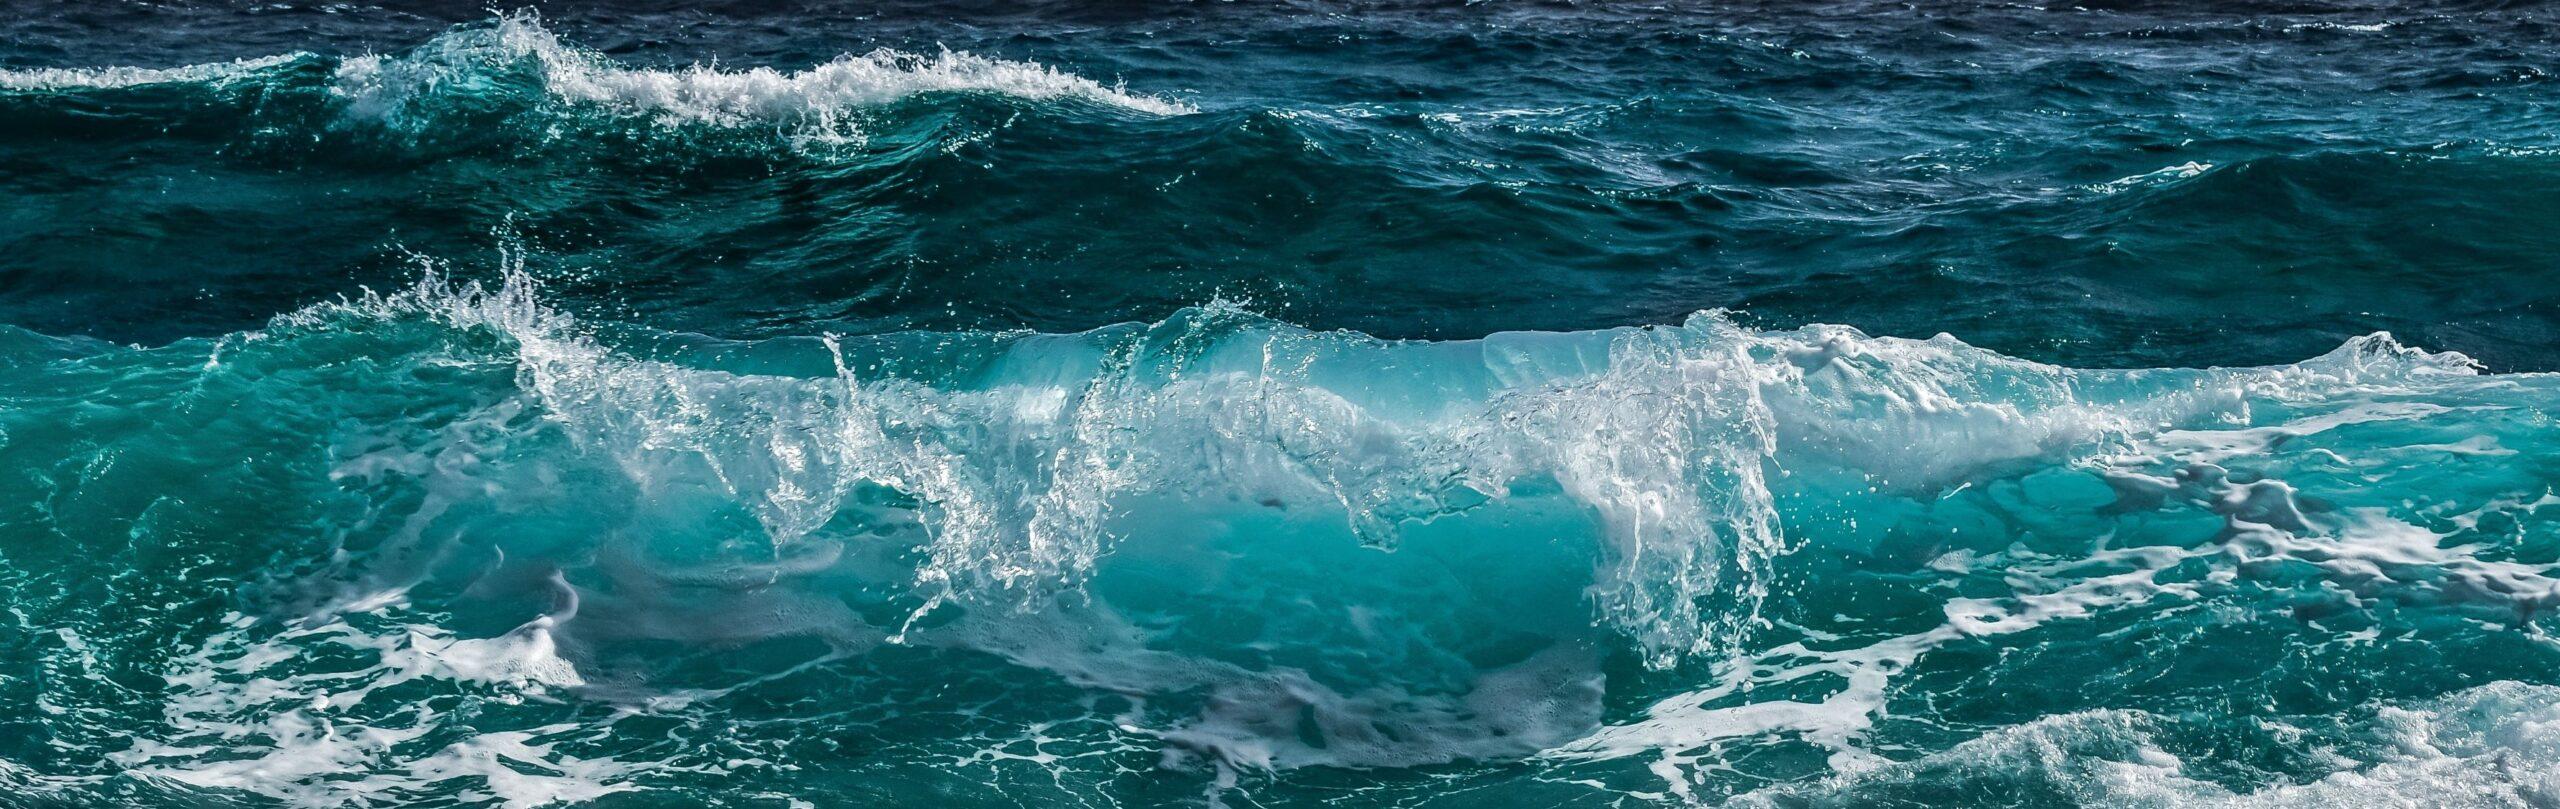 Widescreen-Wave